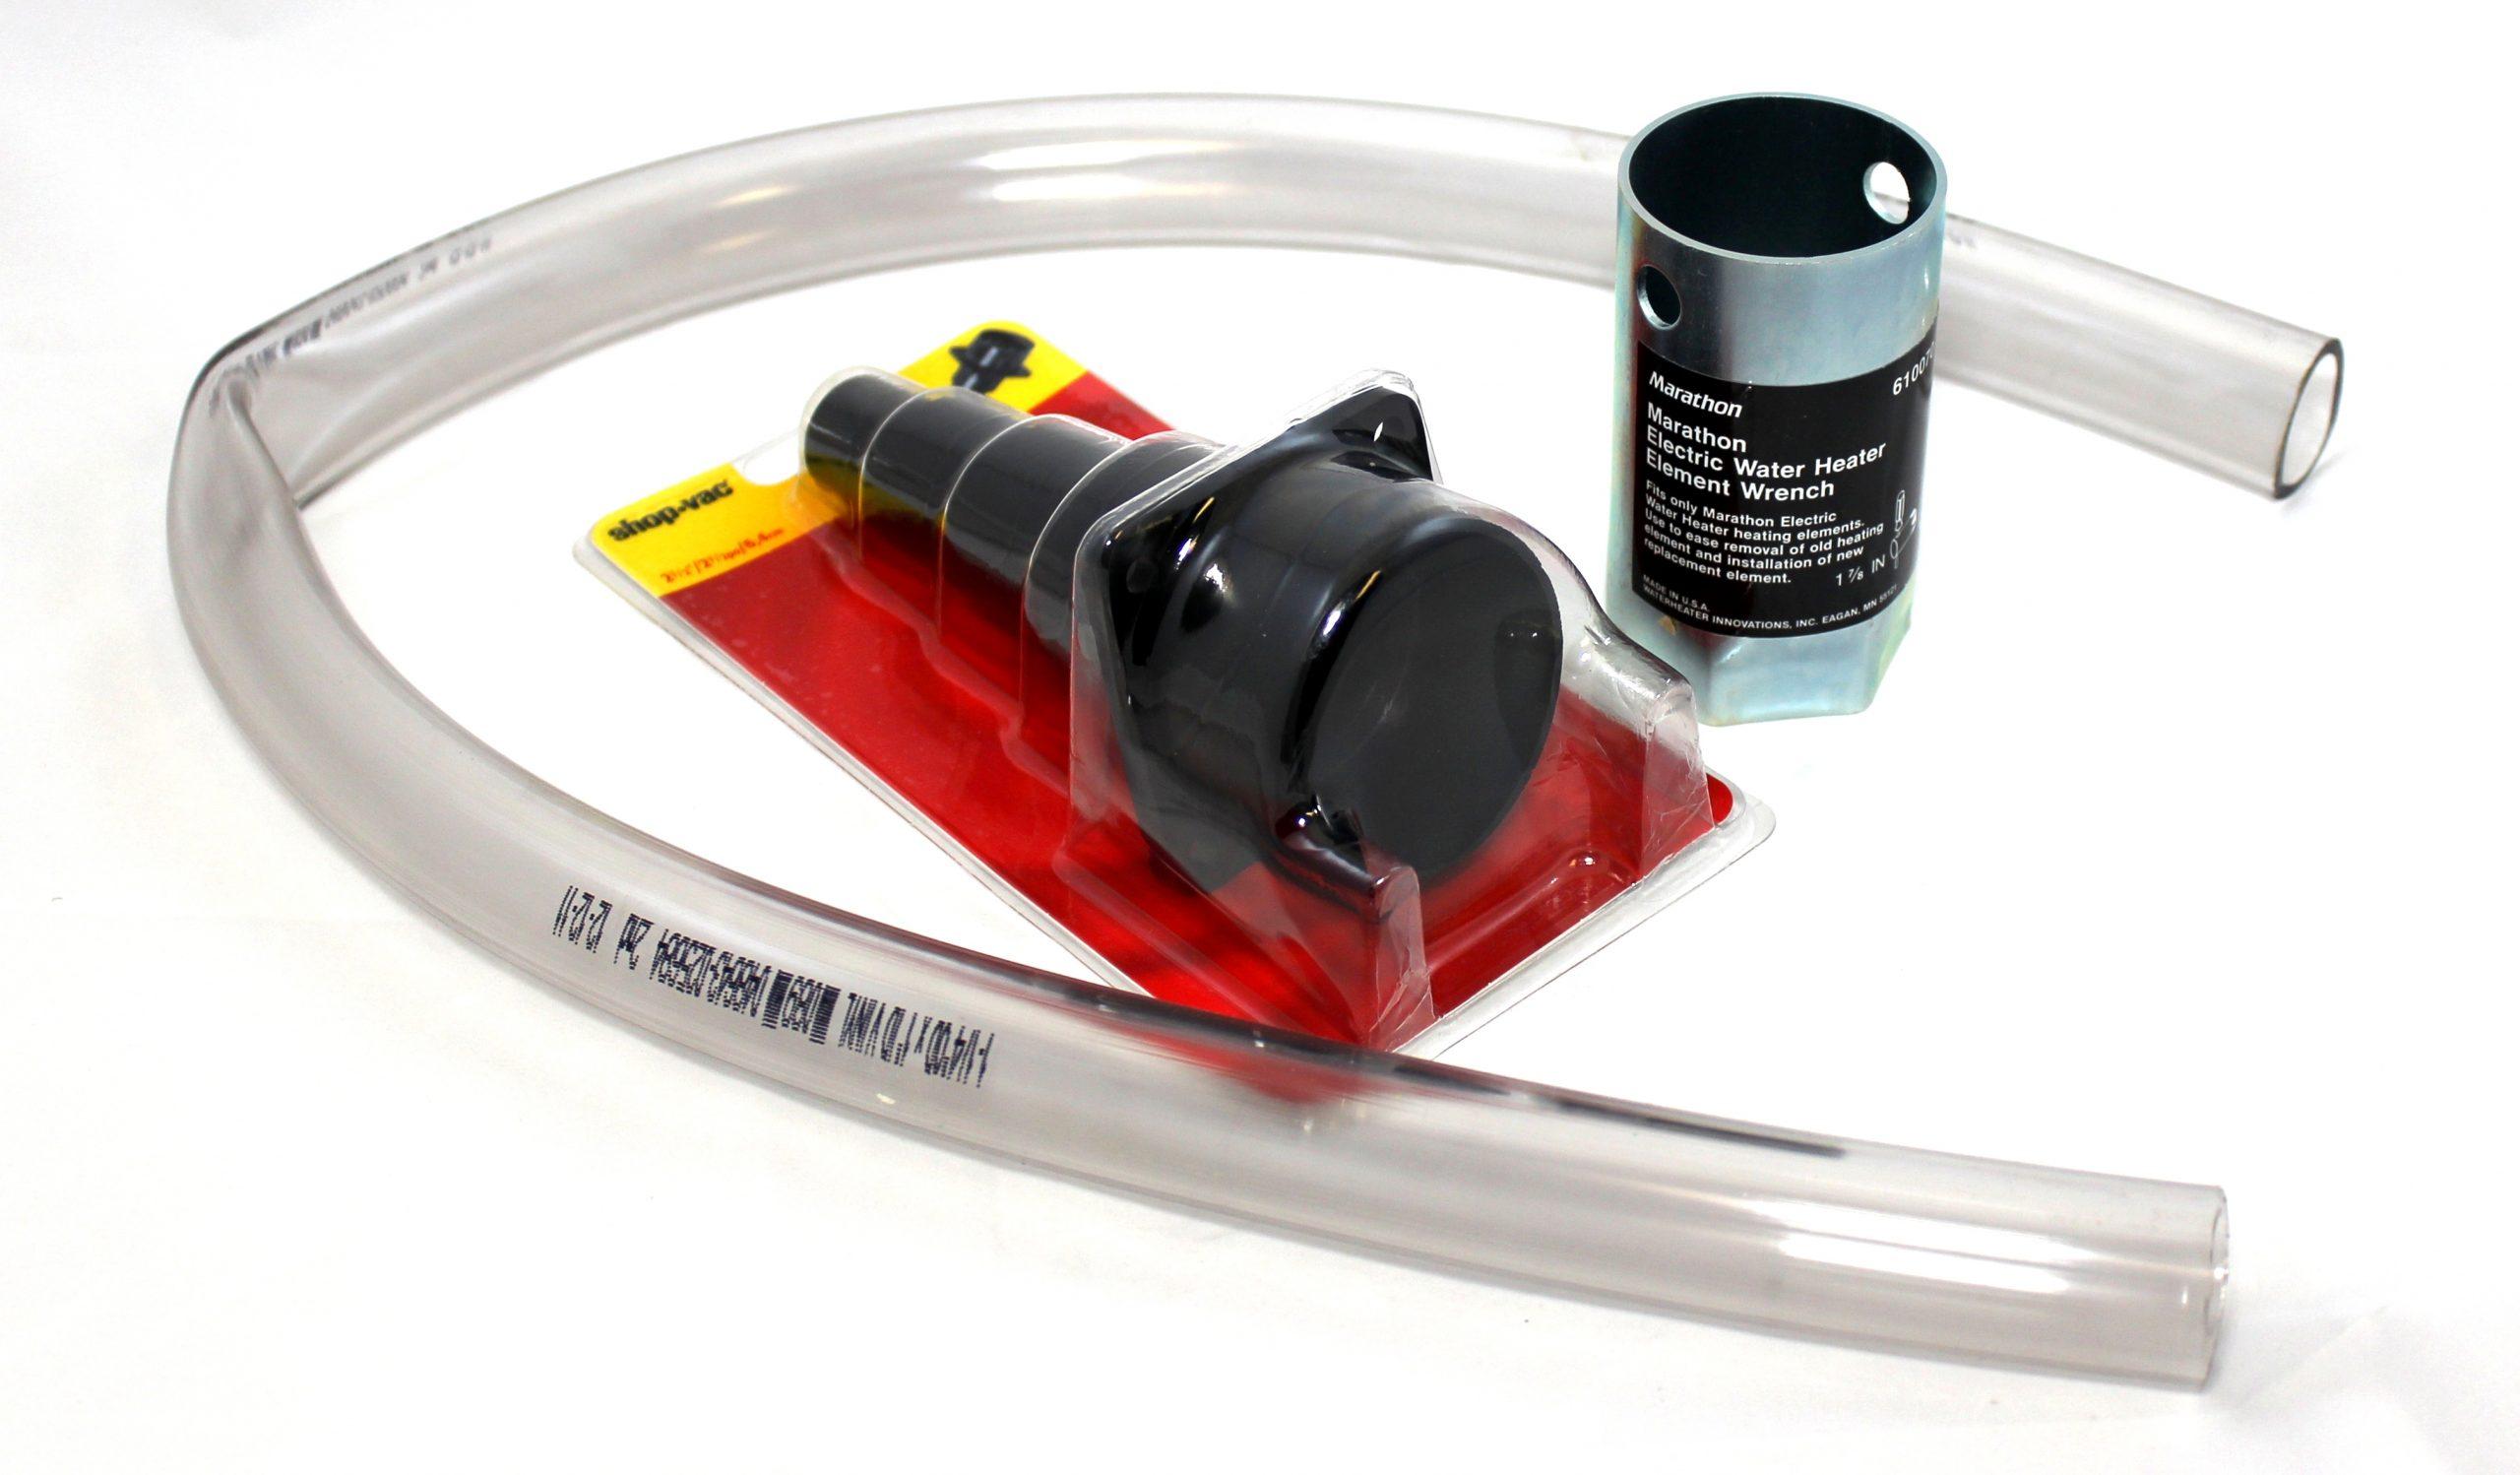 Marathon Water Heater Cleaning Kit Gp Conservation